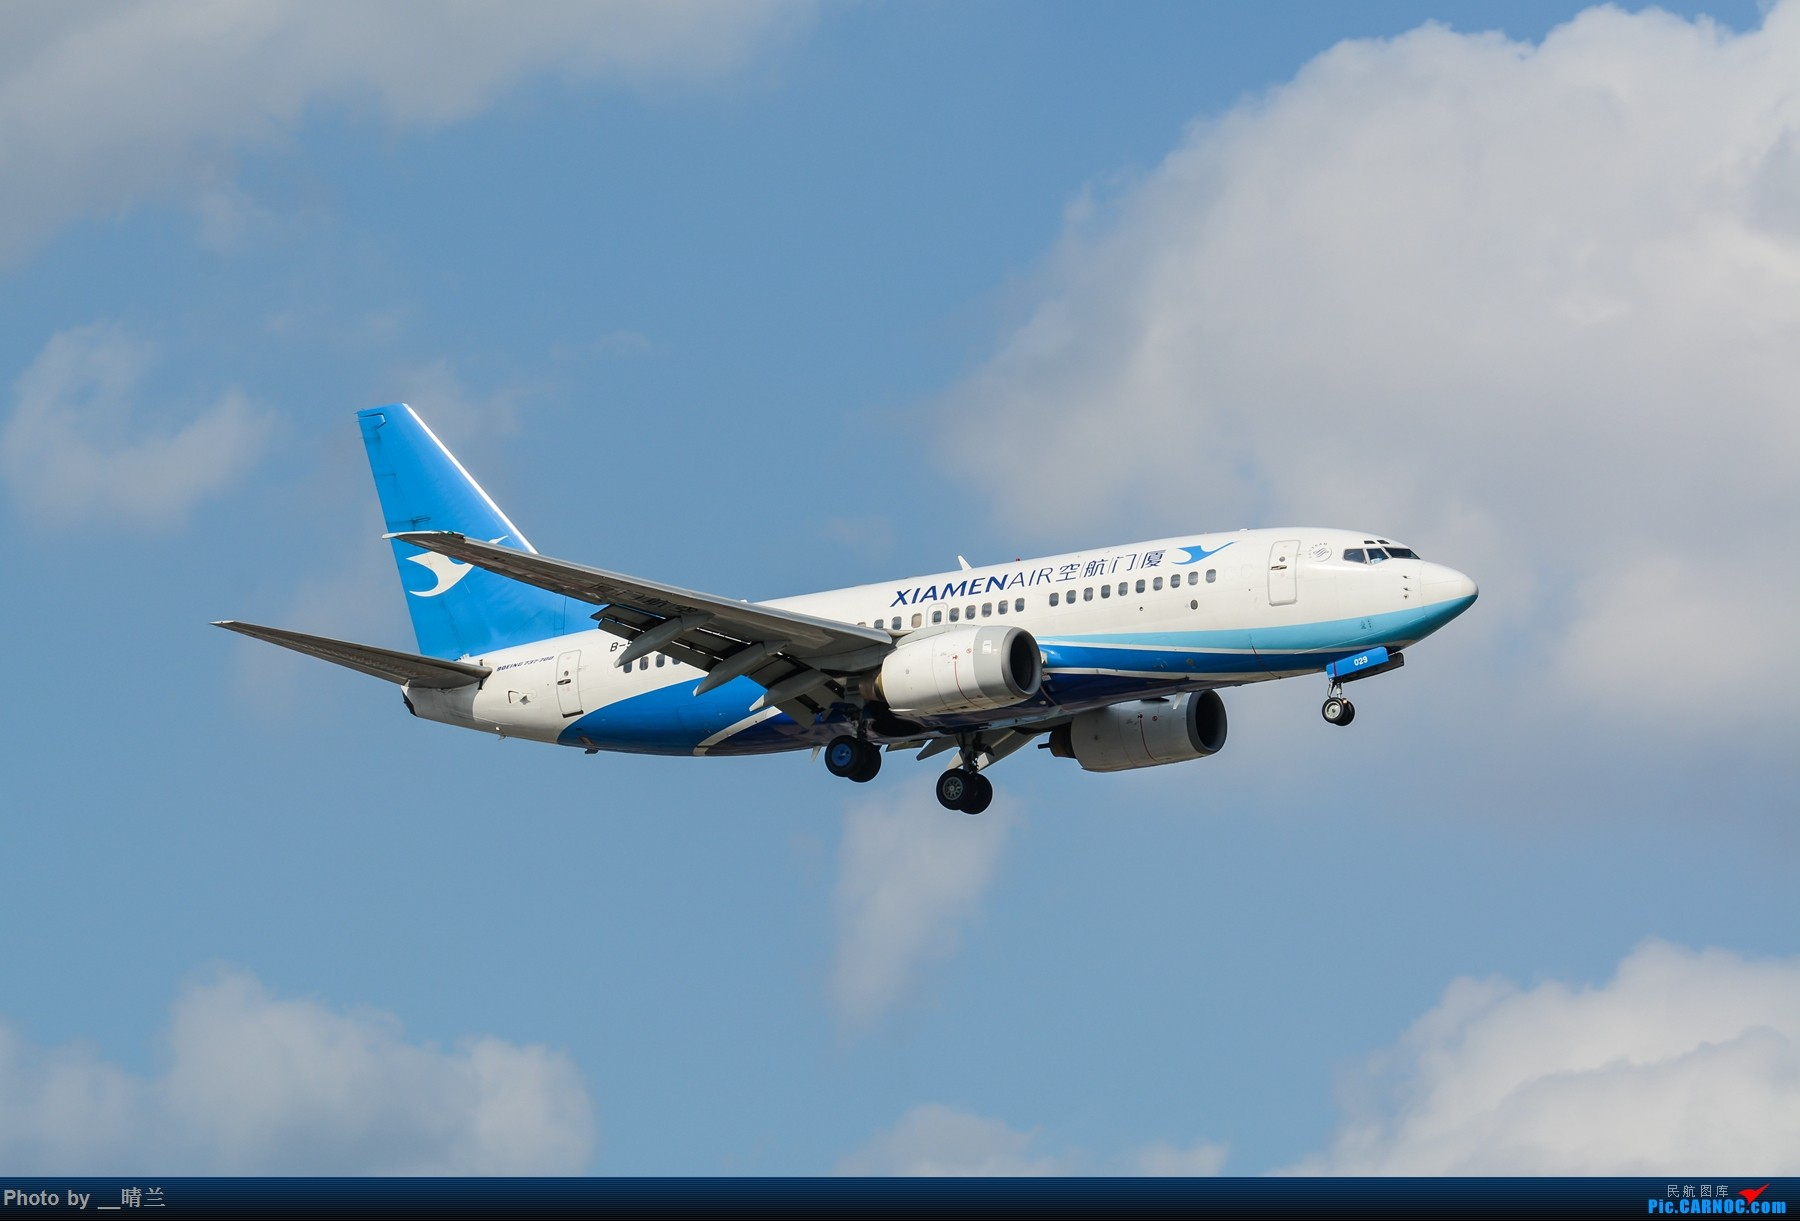 Re:[原创]果然昨天发了图,今天SHA就是大蓝天~~最开心的事莫过于基友们一起拍机! BOEING 737-700 B-5029 中国上海虹桥国际机场